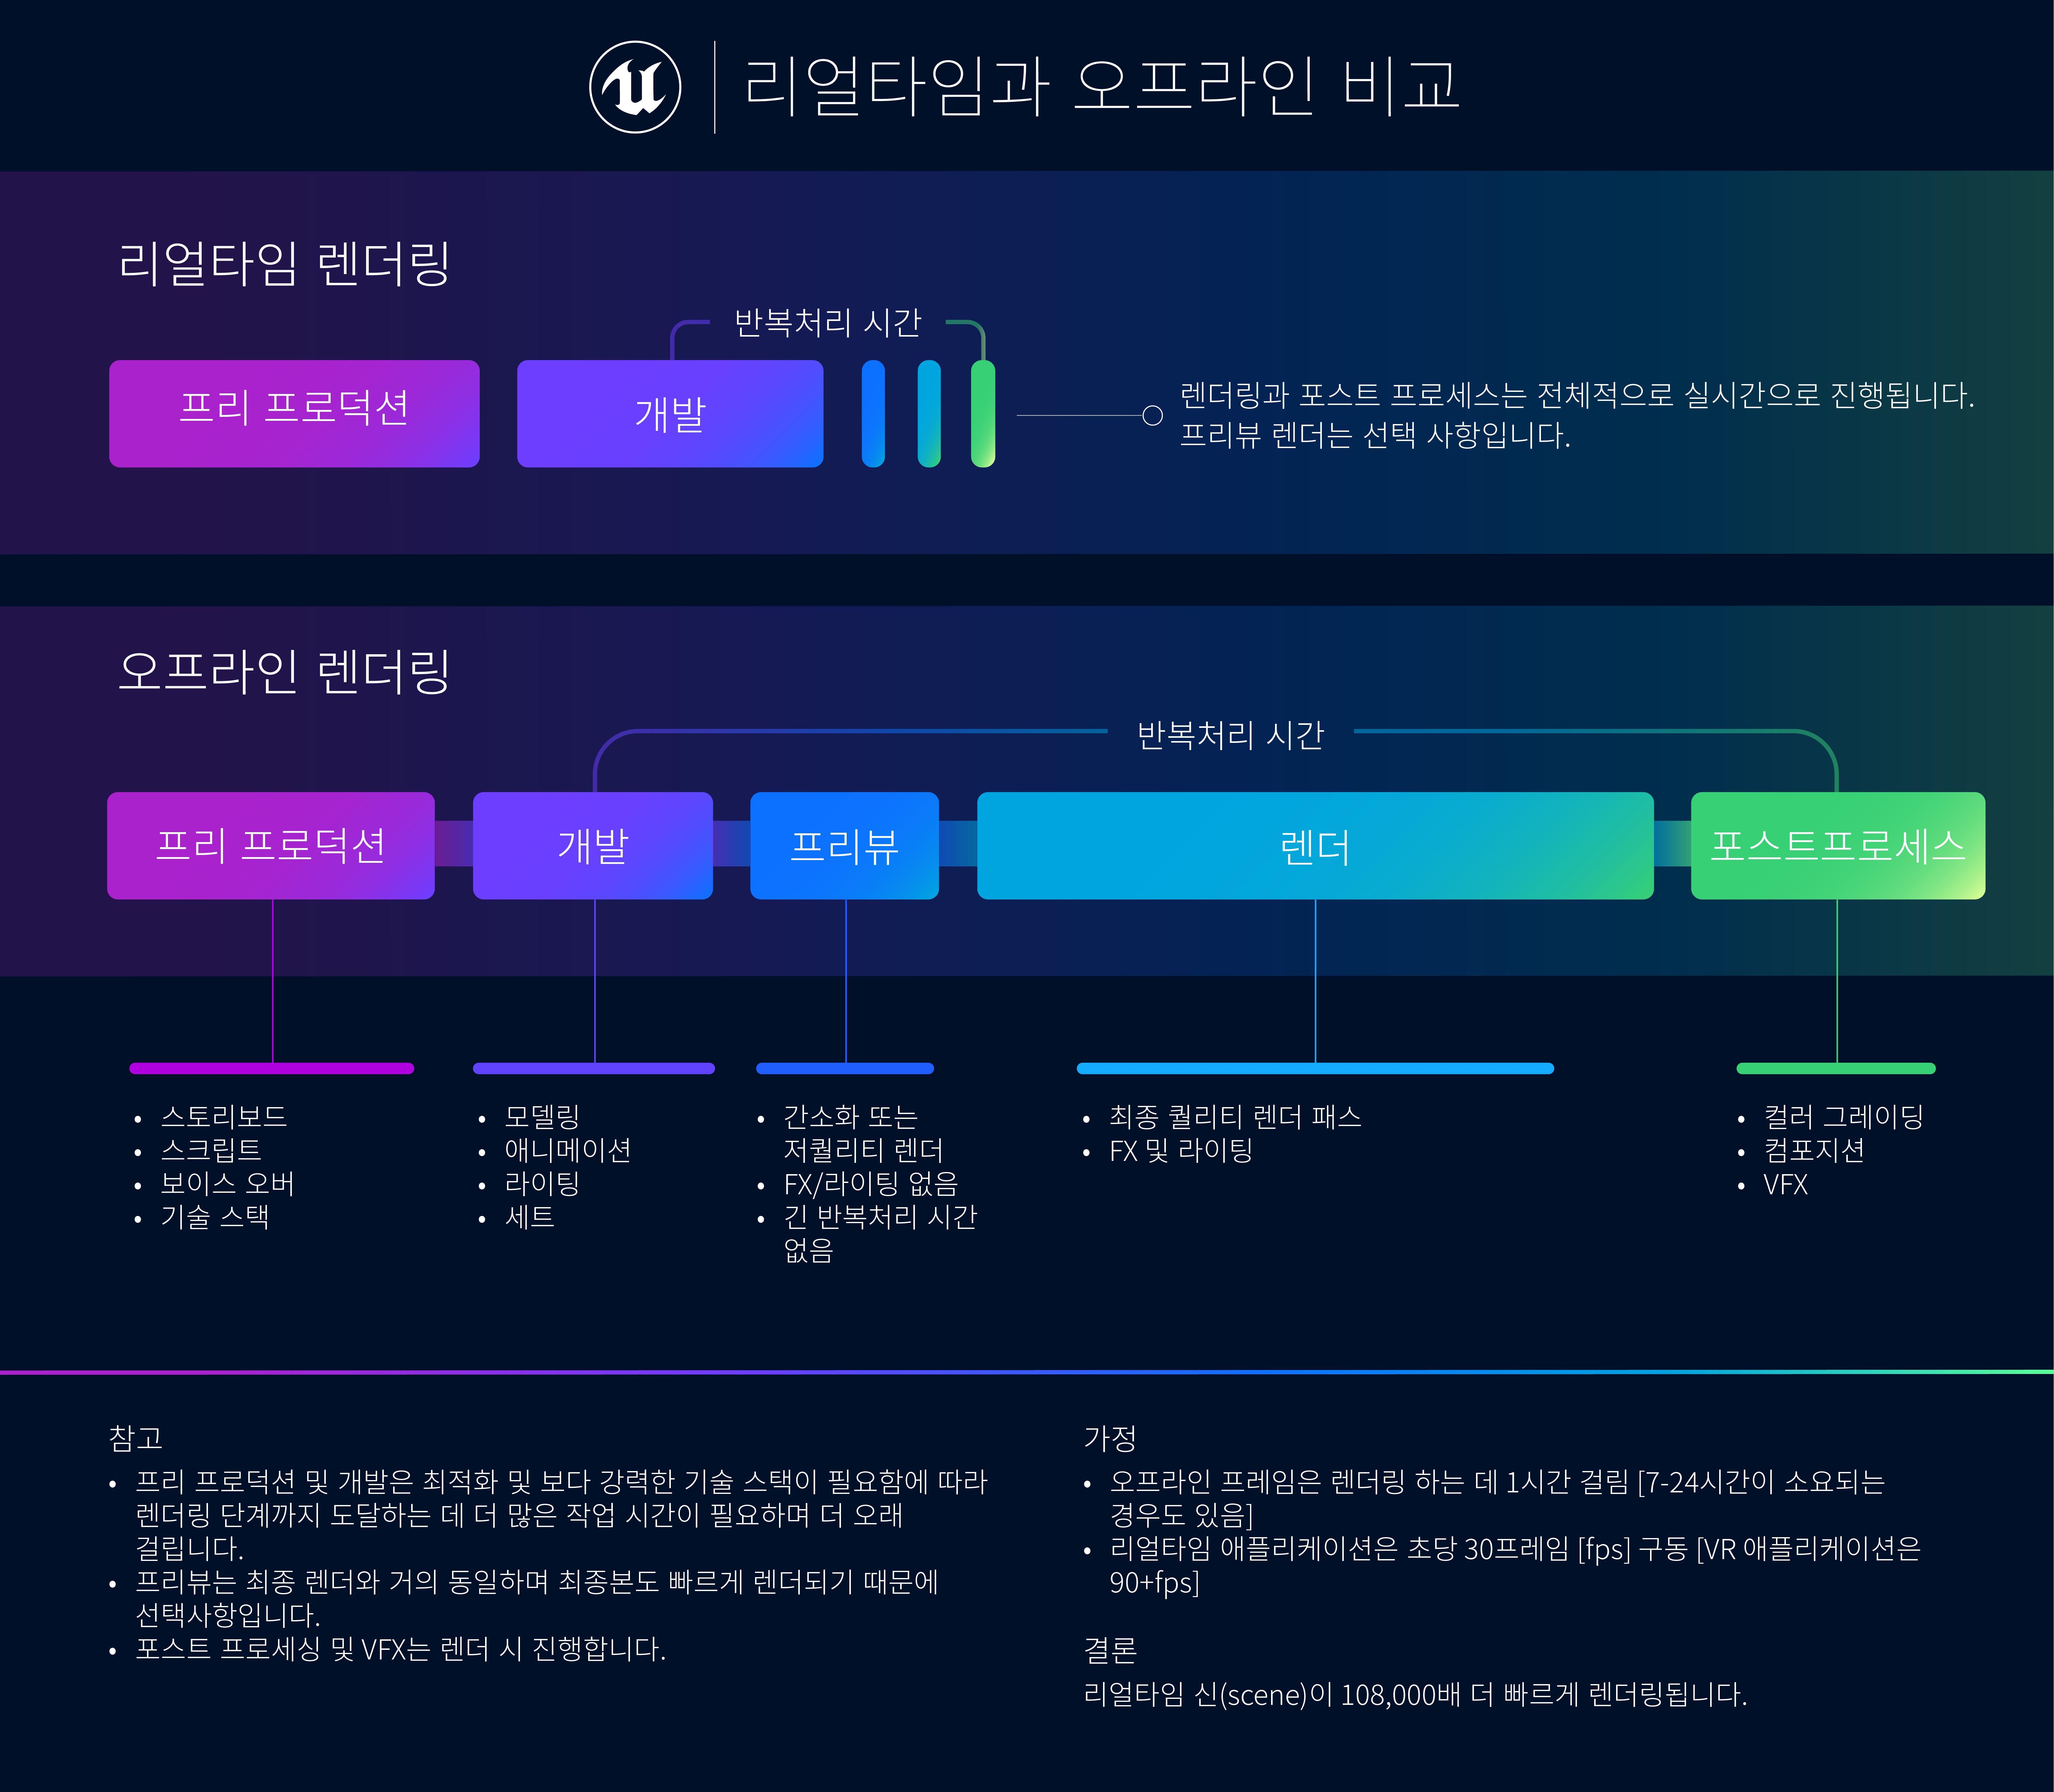 News_Interactive3D_Real-time_vs_Offline_V2.png